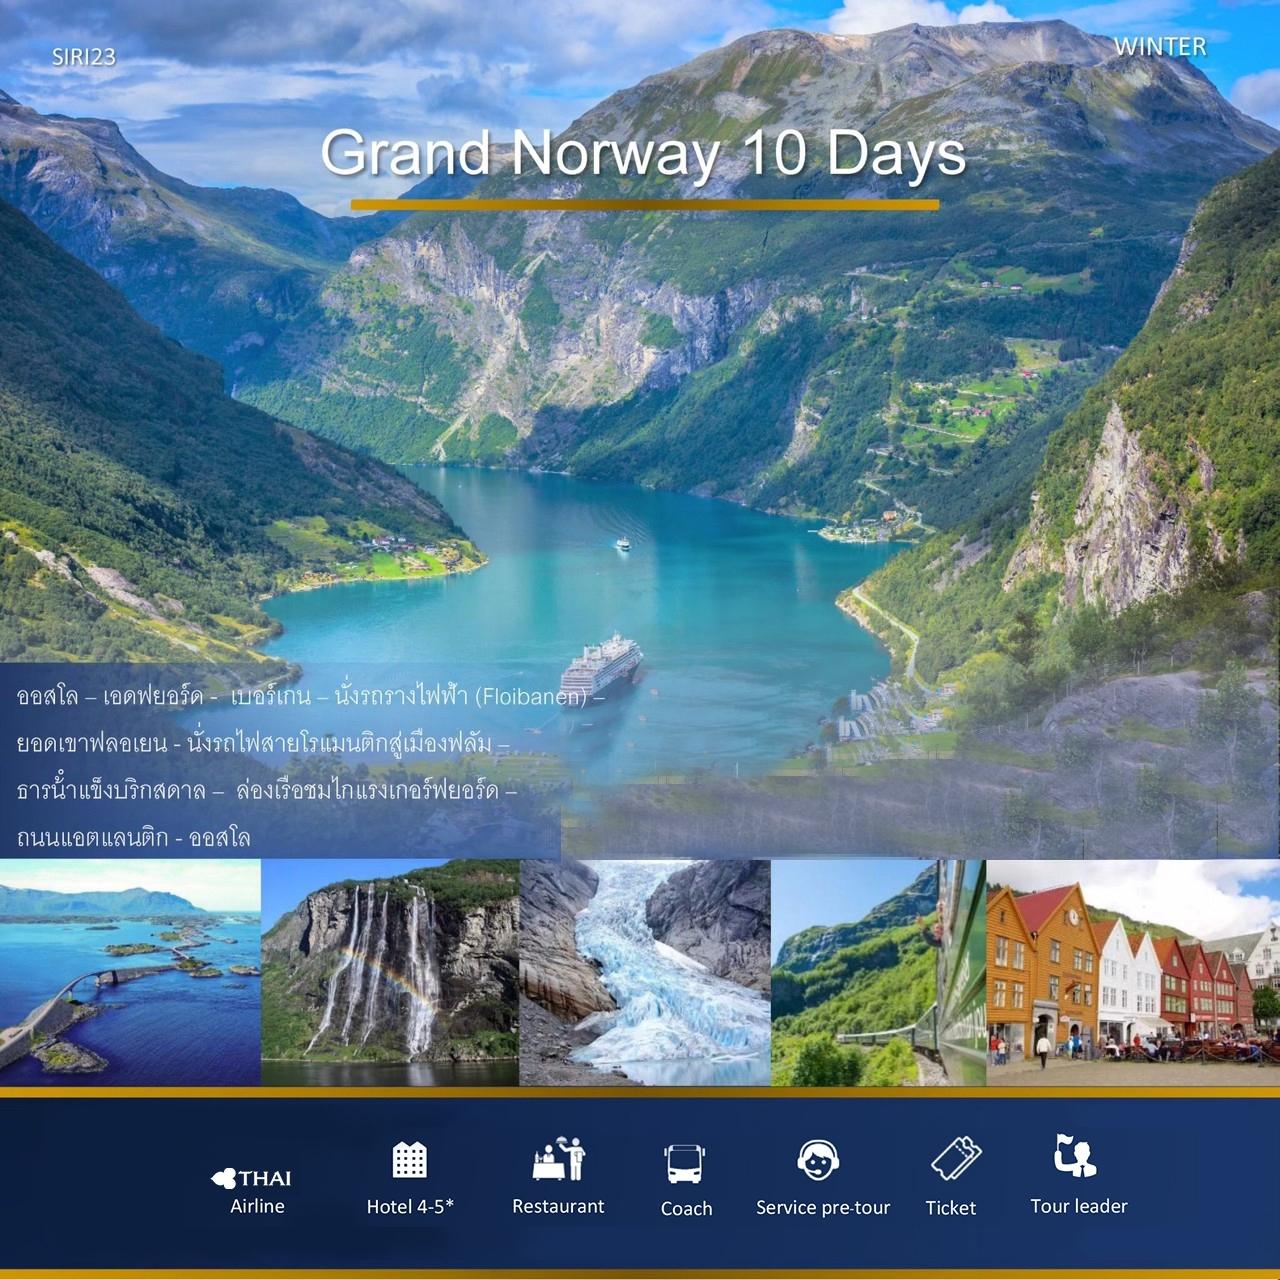 GRAND NORWAY